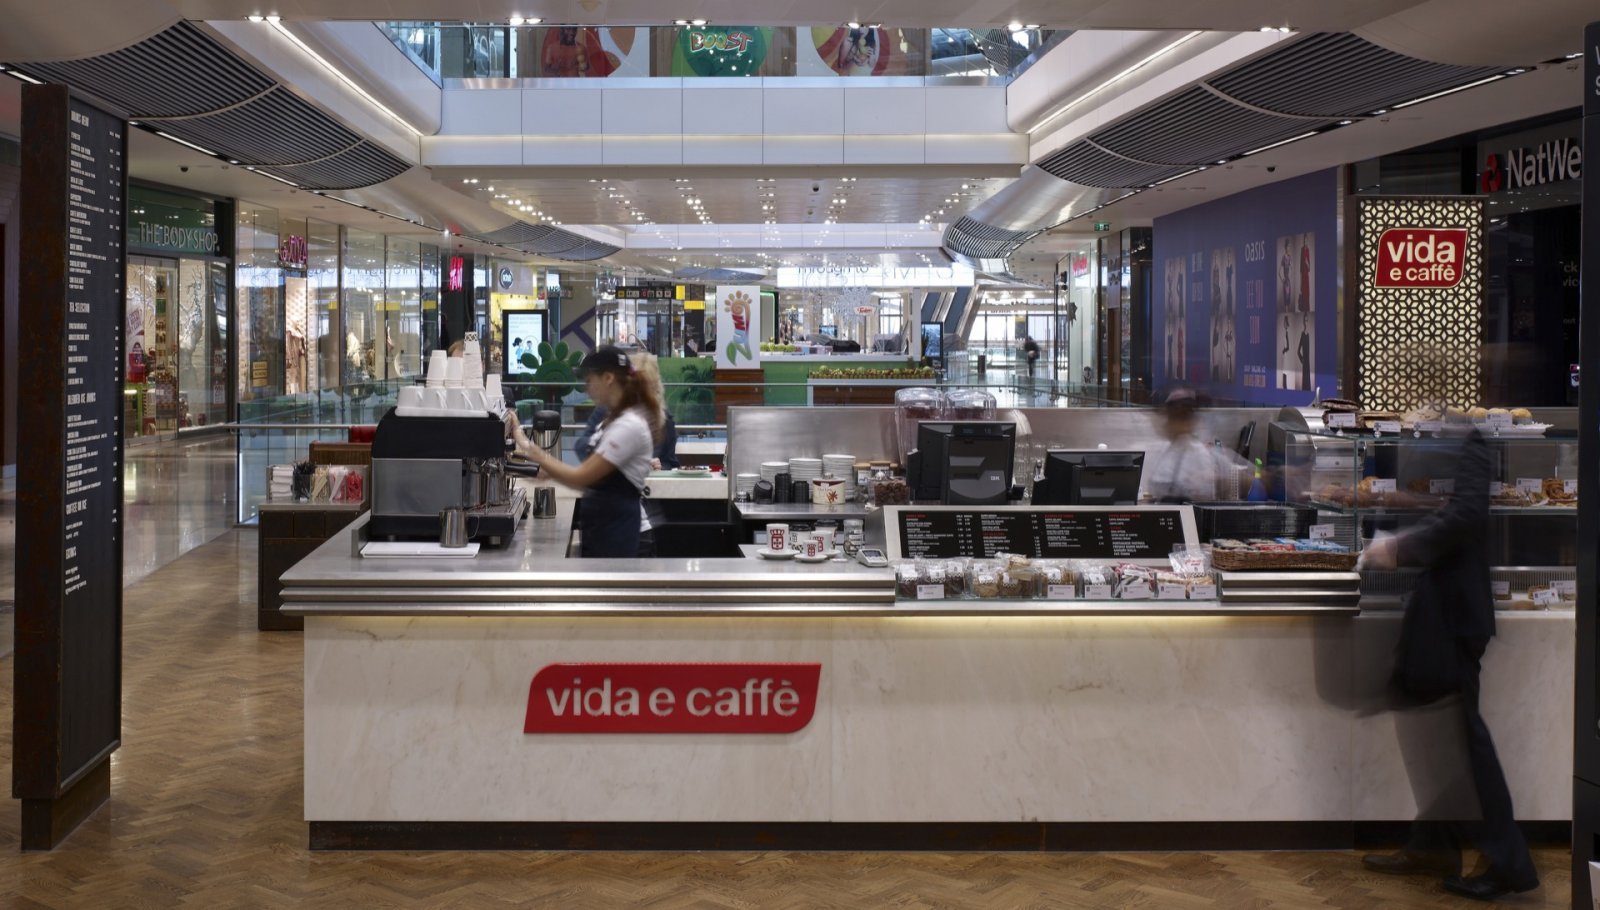 Vida e Caffe, Westfield Stratford 6